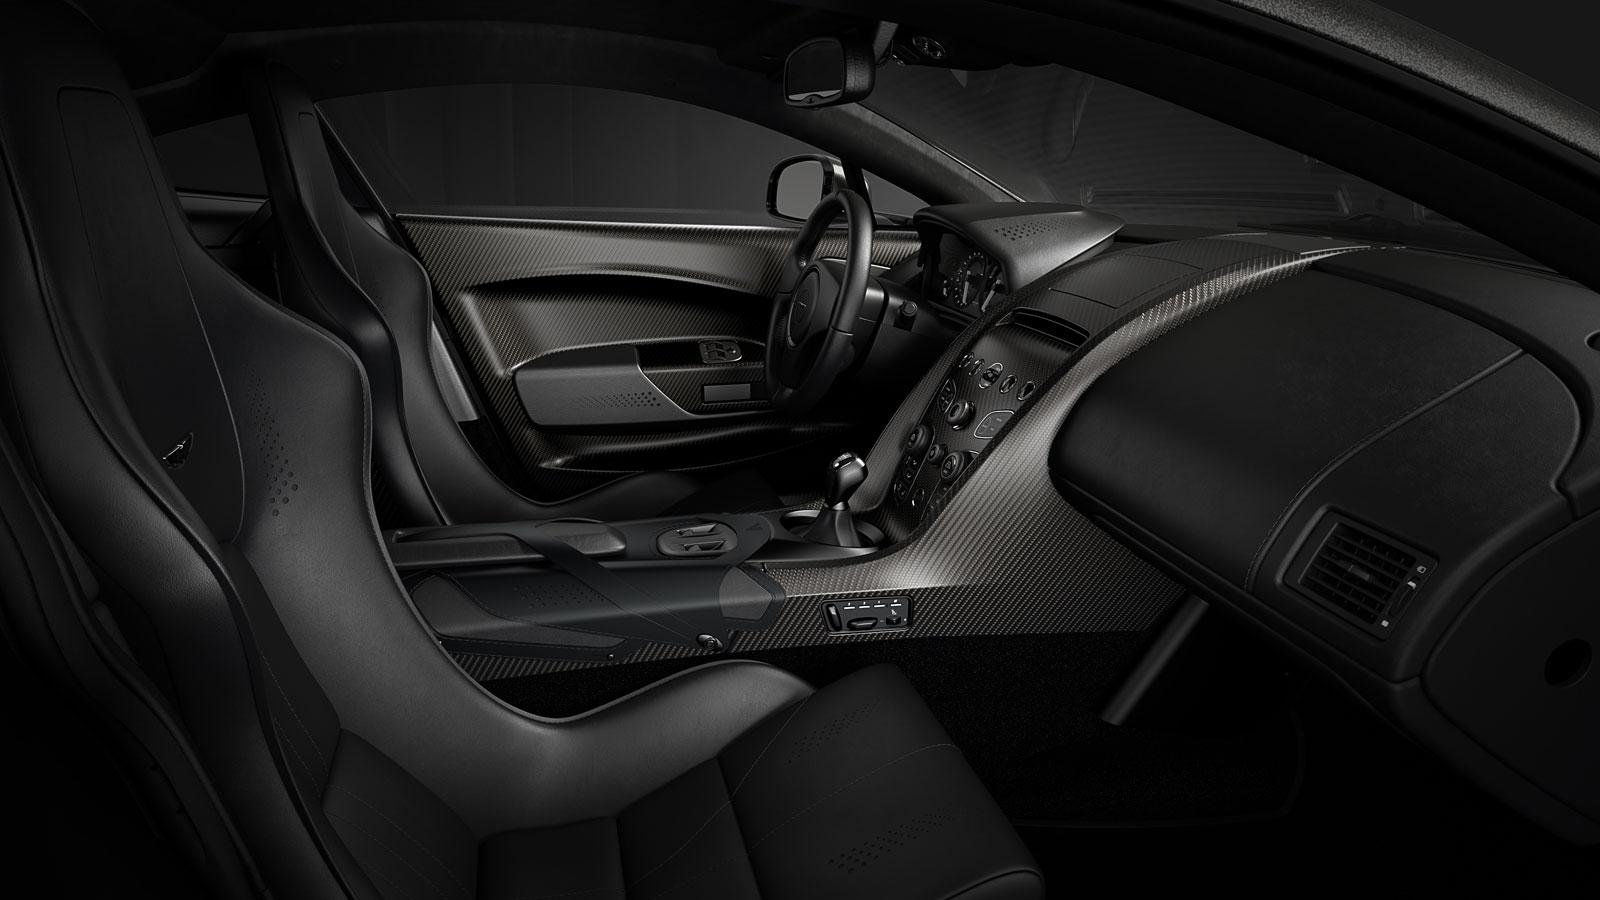 Aston Martin V12 Vantage V600 Interior Car Body Design